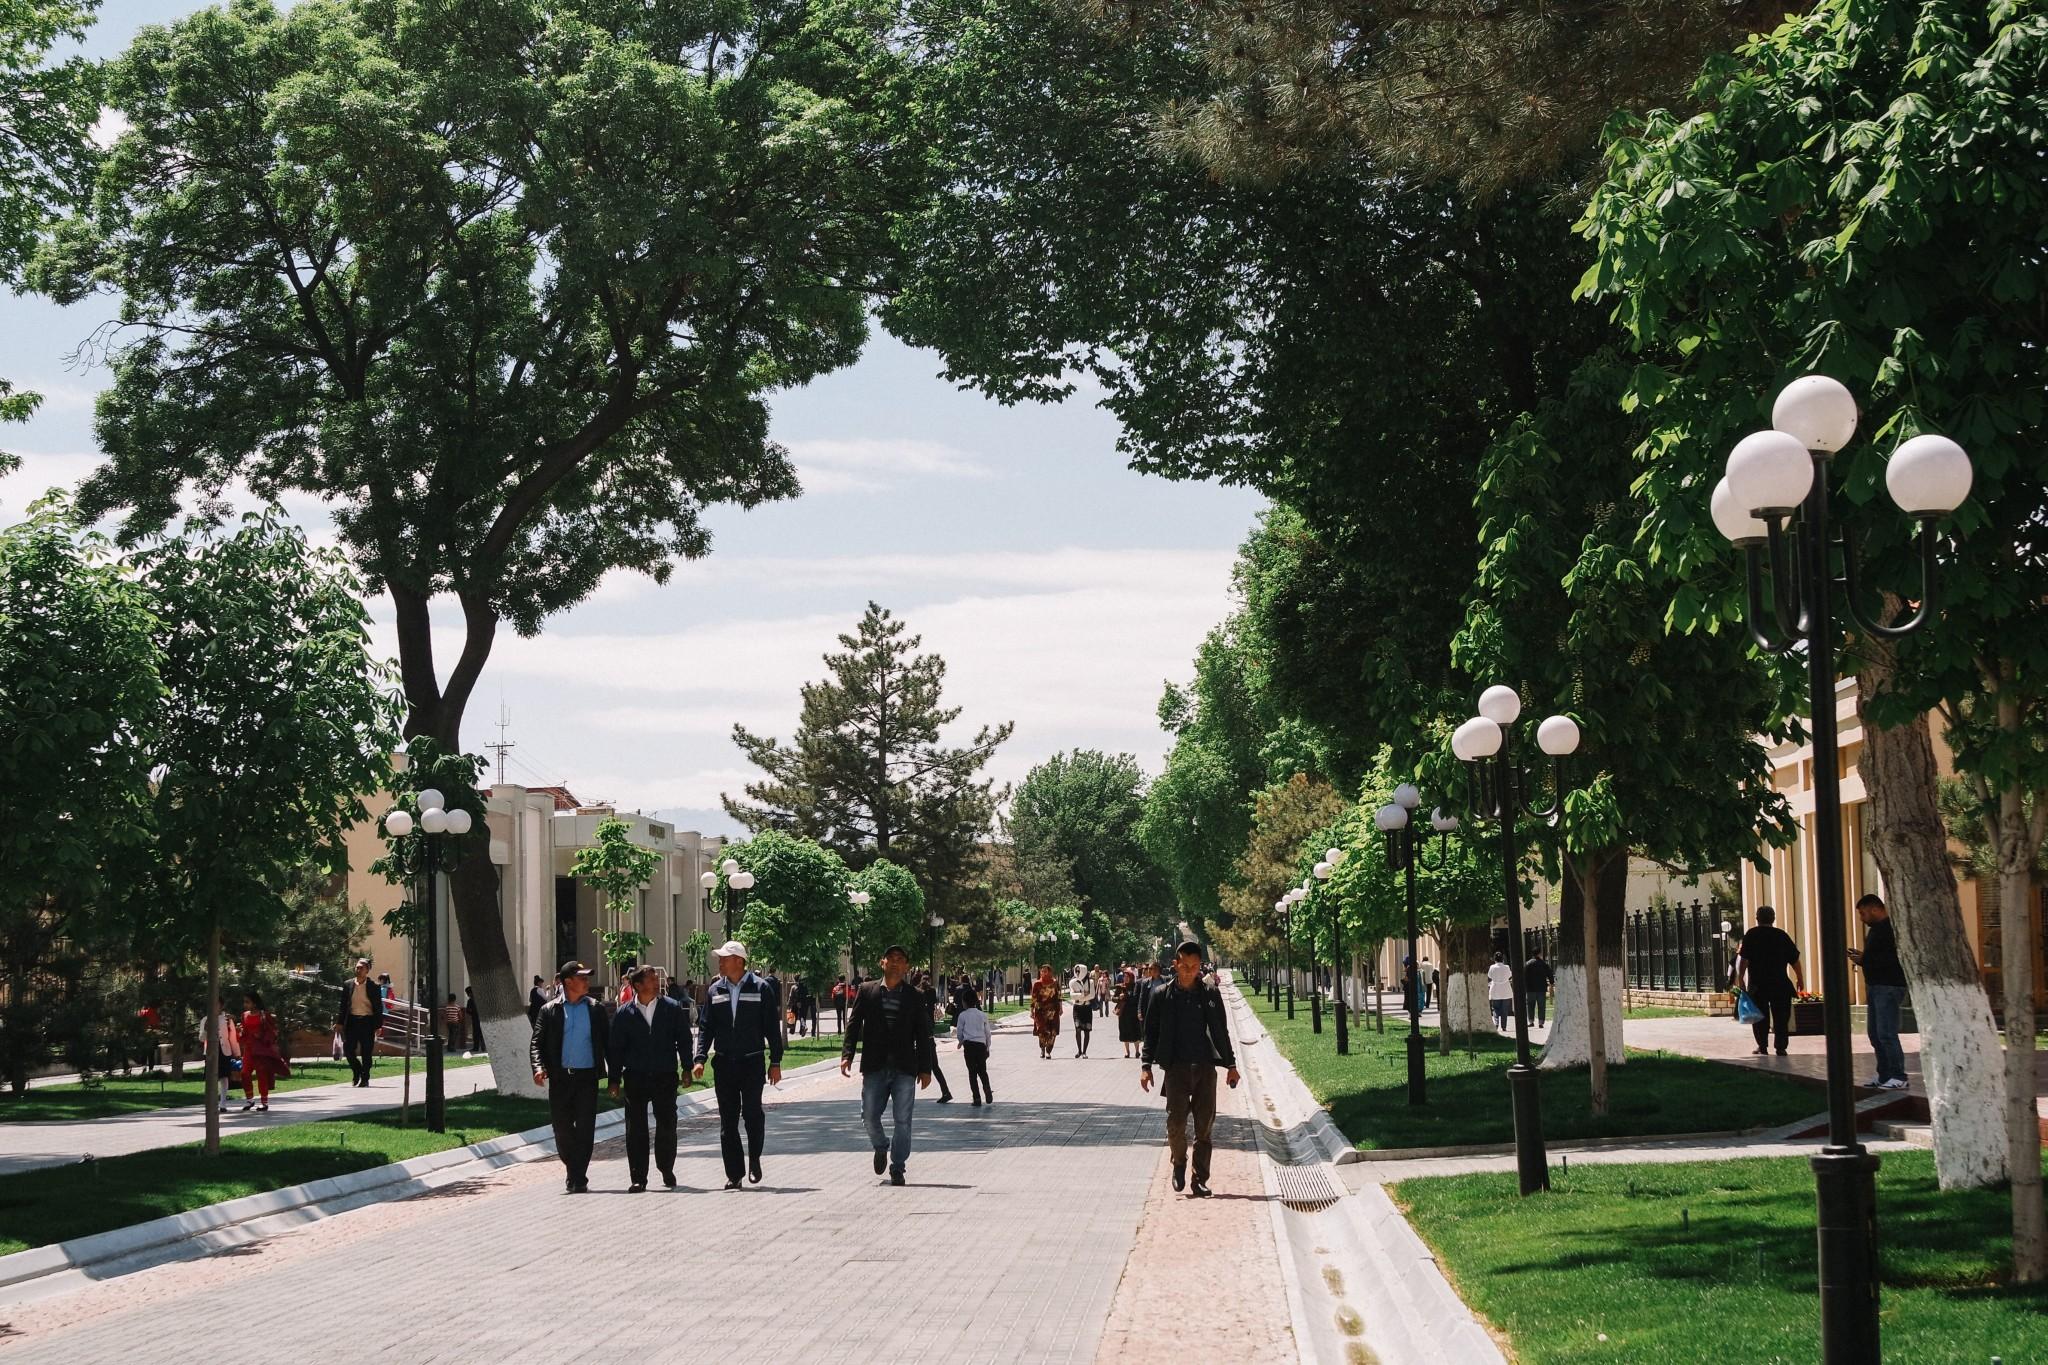 В Узбекистане свыше 140 человек заразились пневмонией за сутки — статистика